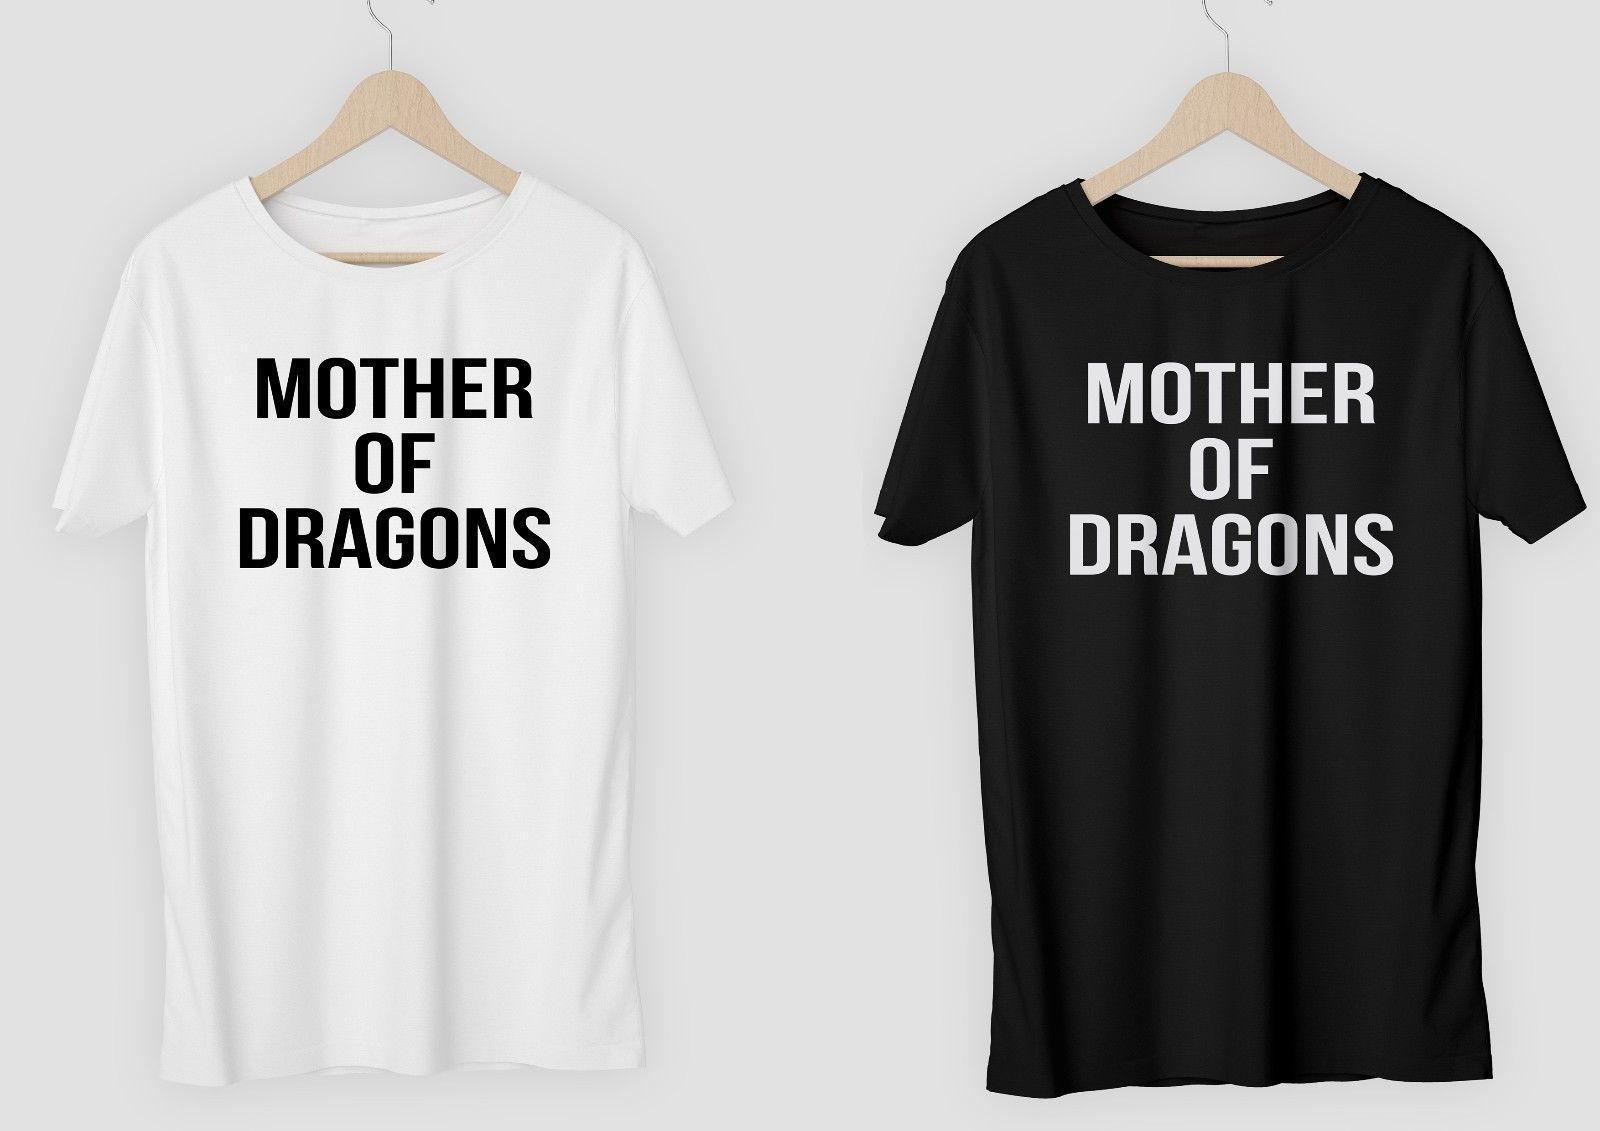 07b6ff80e Mother Of Dragons T SHIRT OR Diy VINYL LADIES V NECK Game Of Thrones  Khaleesi Funny Unisex Cool Shirts Formal Shirts From Tshirtbakers, $12.96|  DHgate.Com